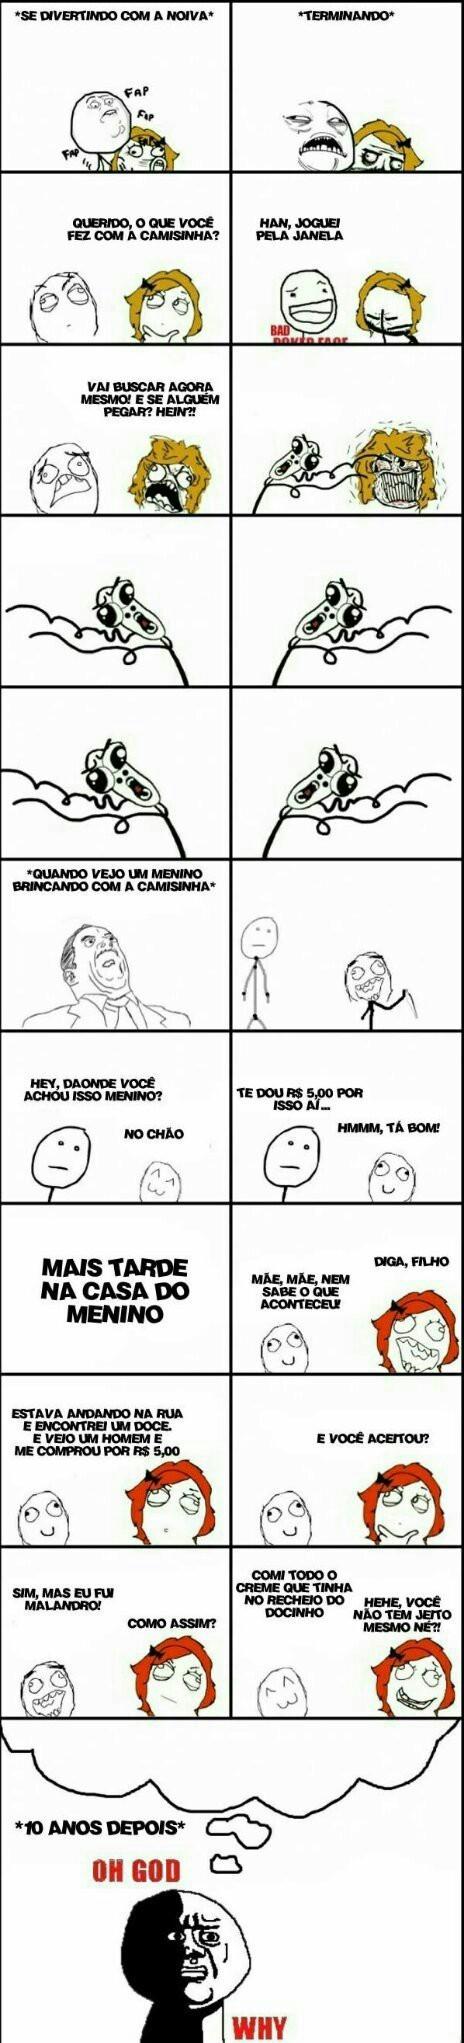 ▲ - meme